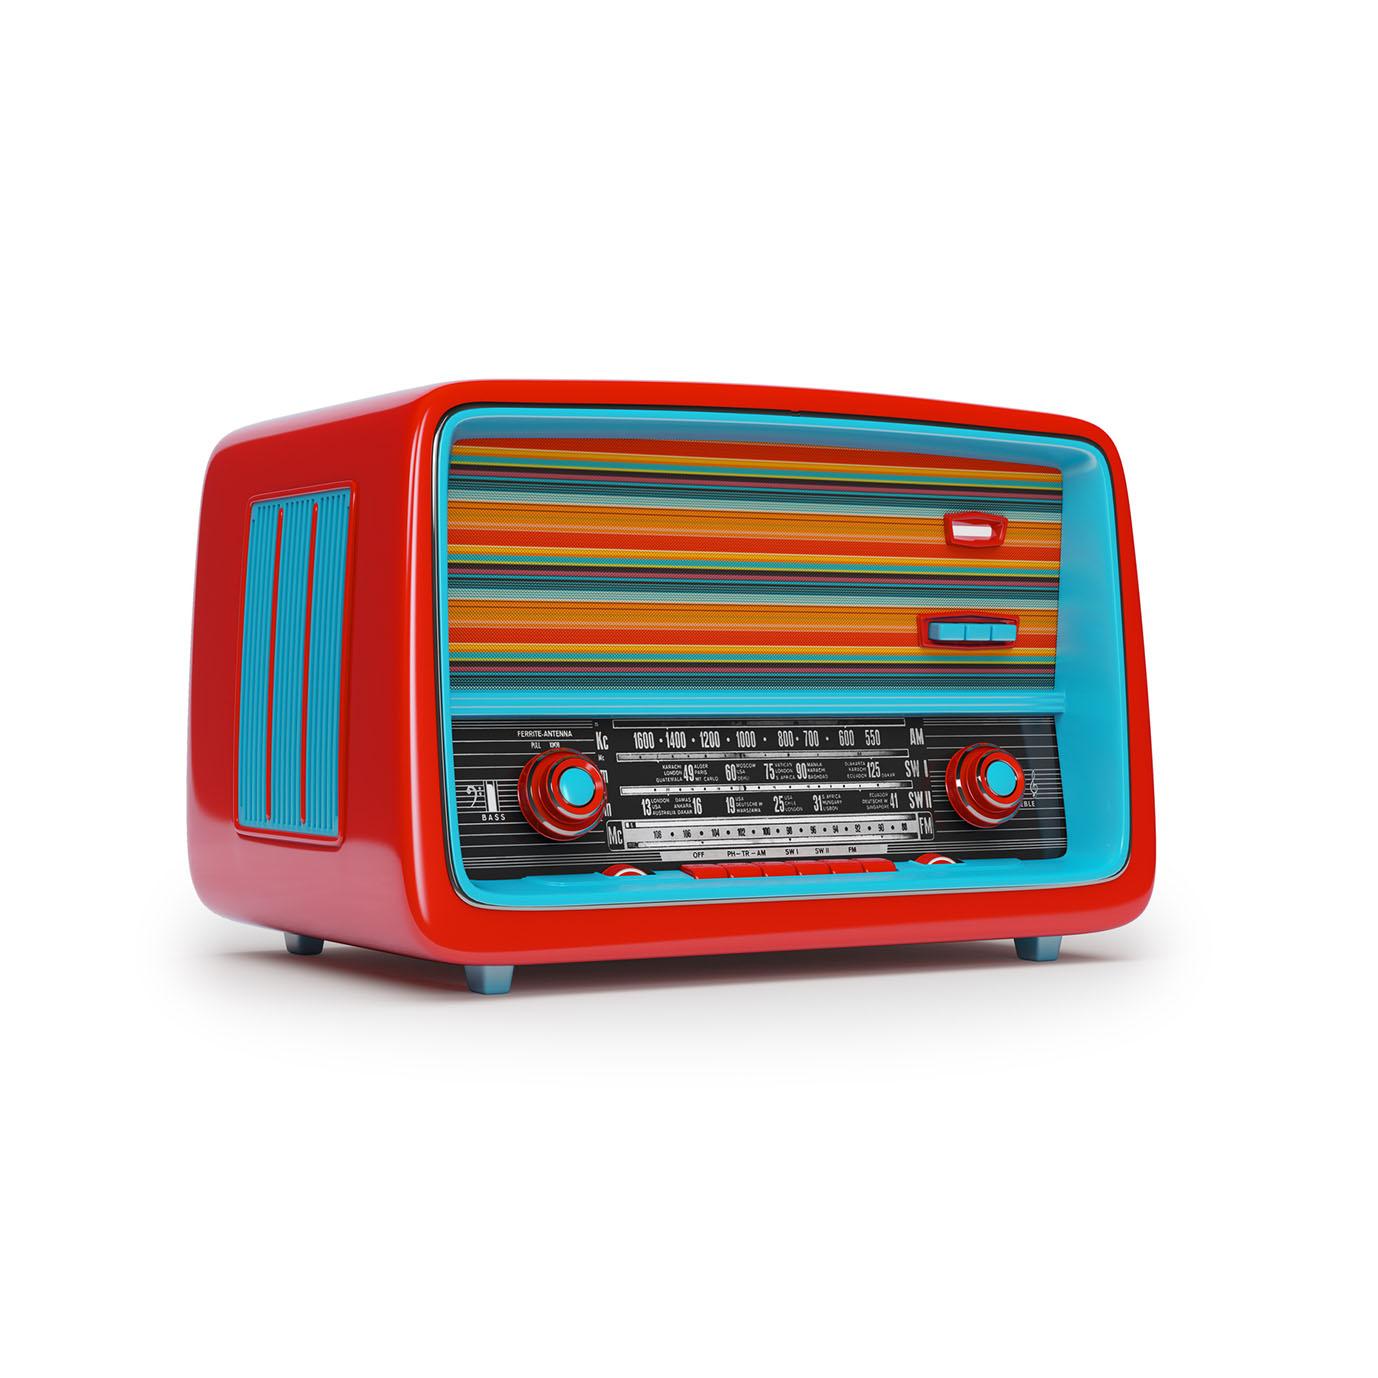 Xdr S40dbp further Vda likewise 182375205923 additionally Radios additionally Panasonic rx d55gc k high power mp3 cd. on portable radio